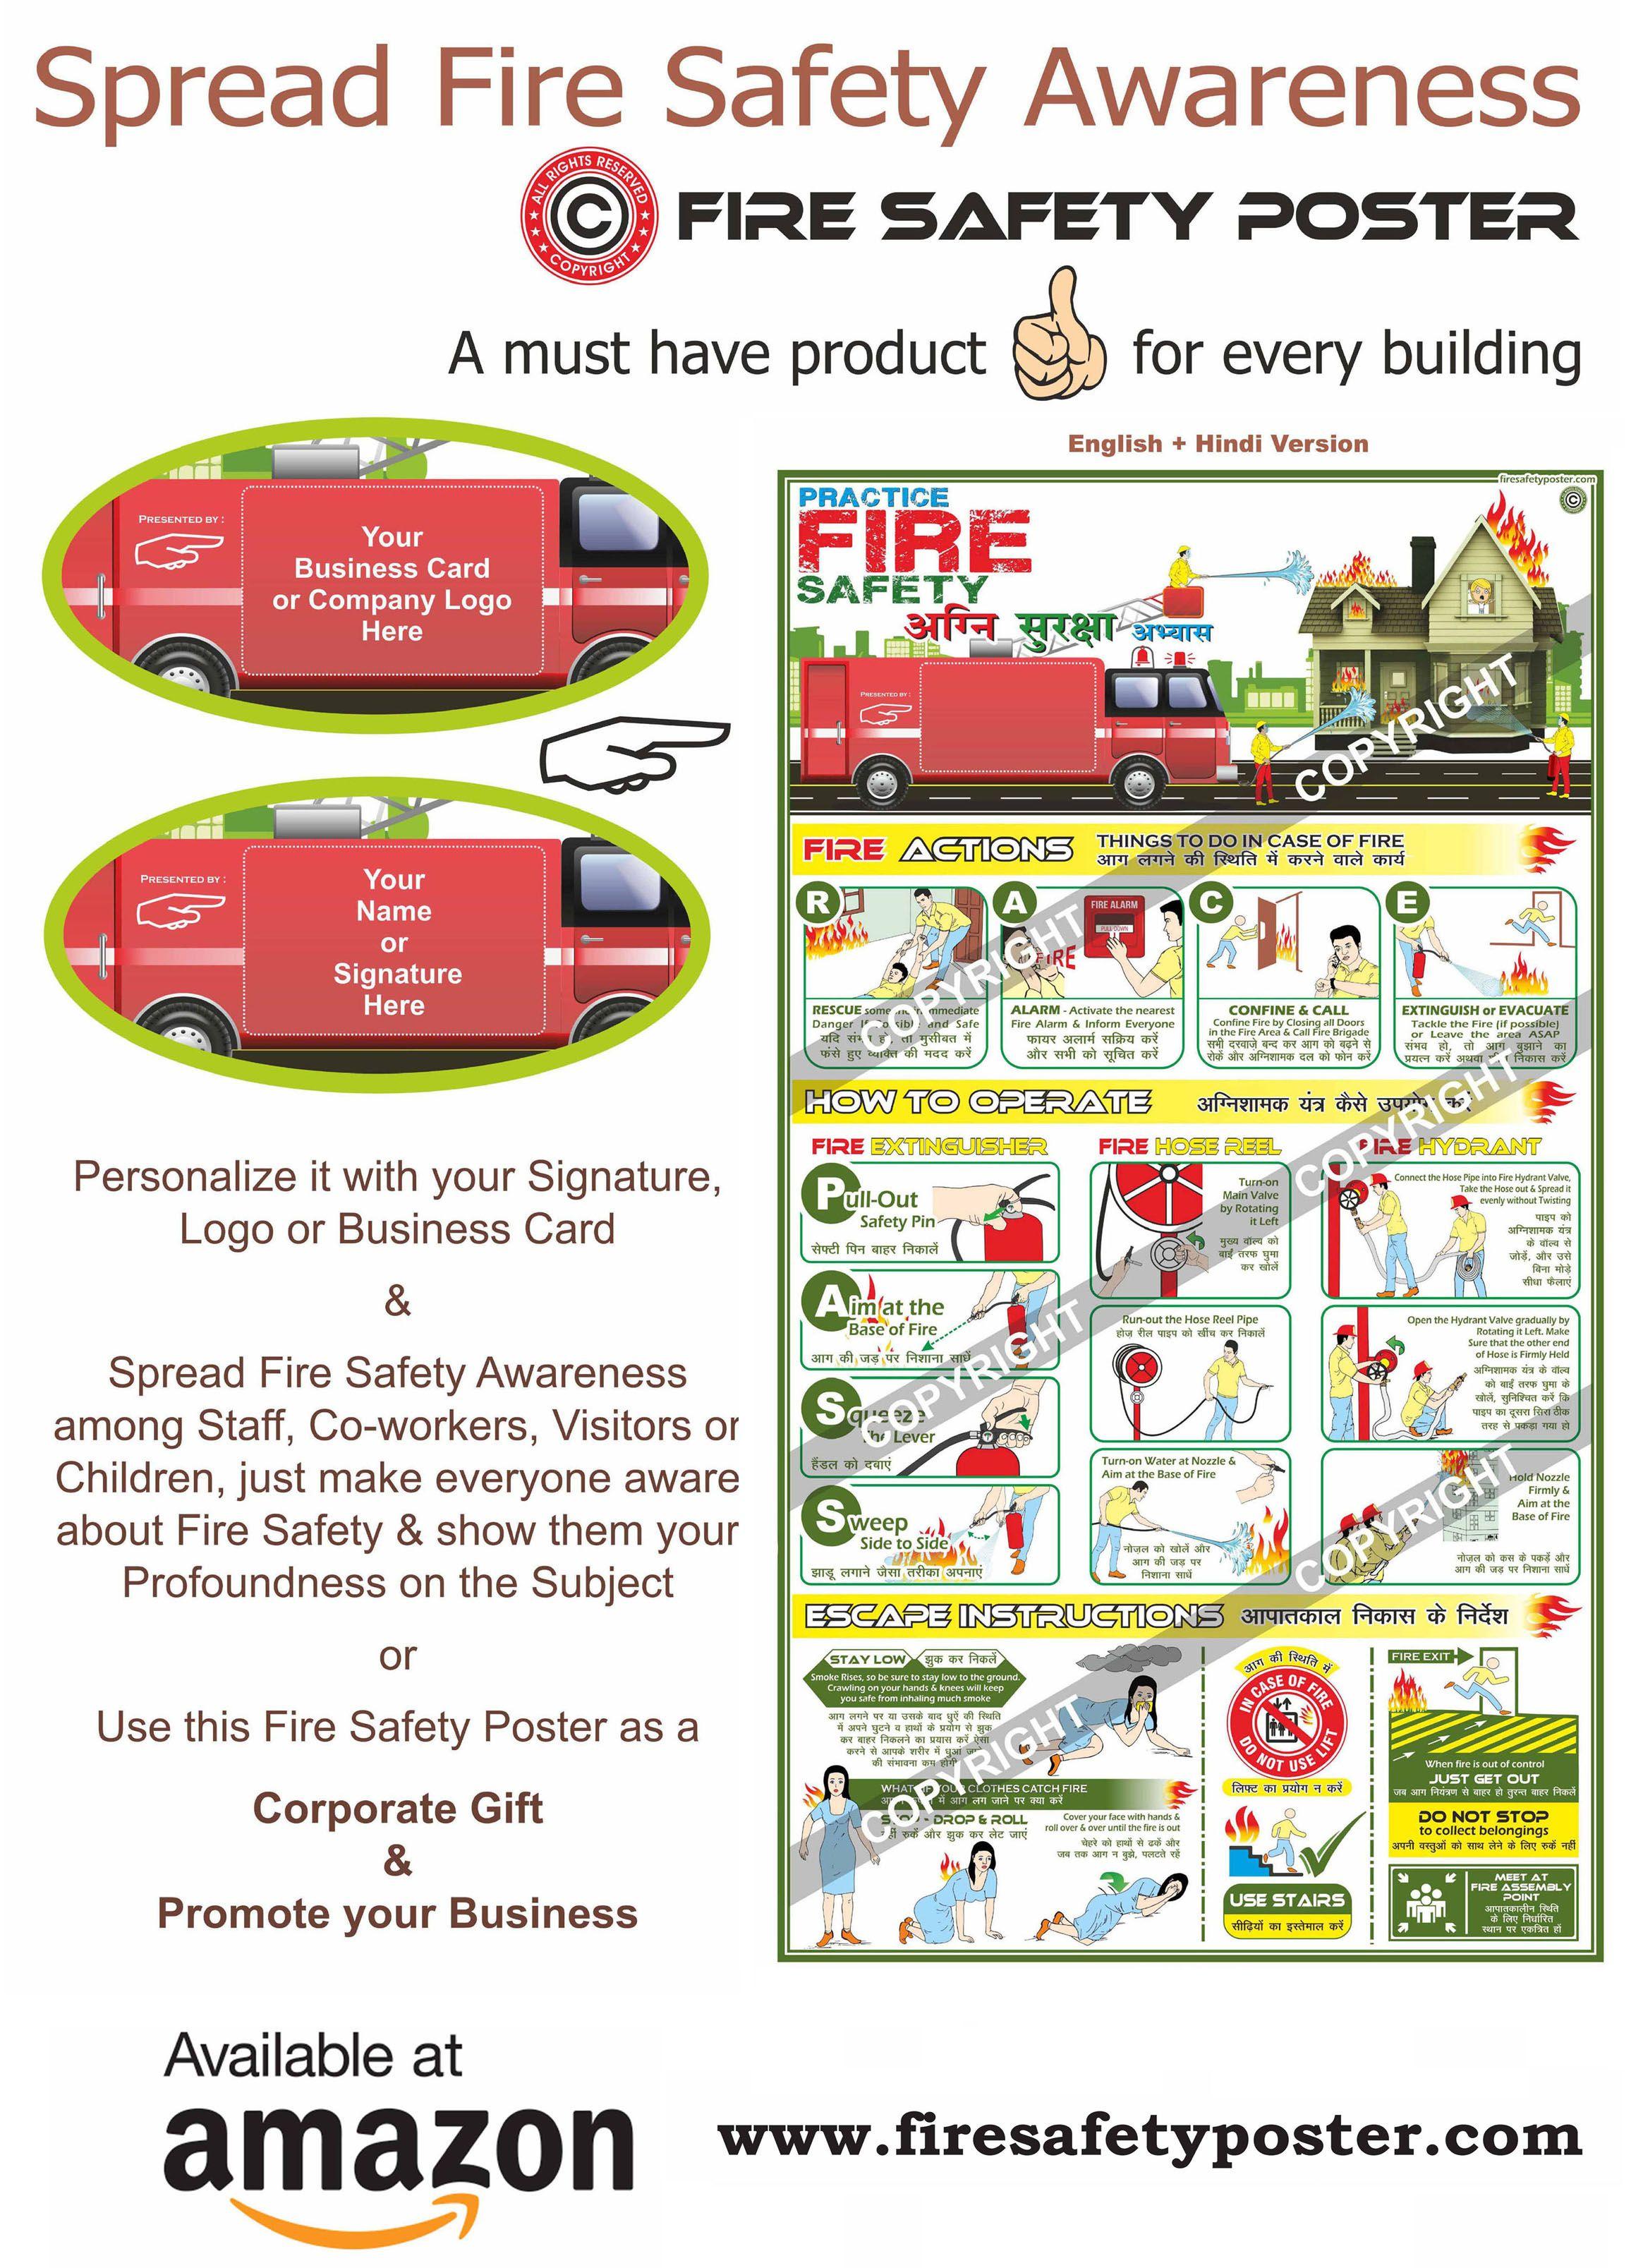 (English + Hindi Version) Fire Safety Awareness, Training